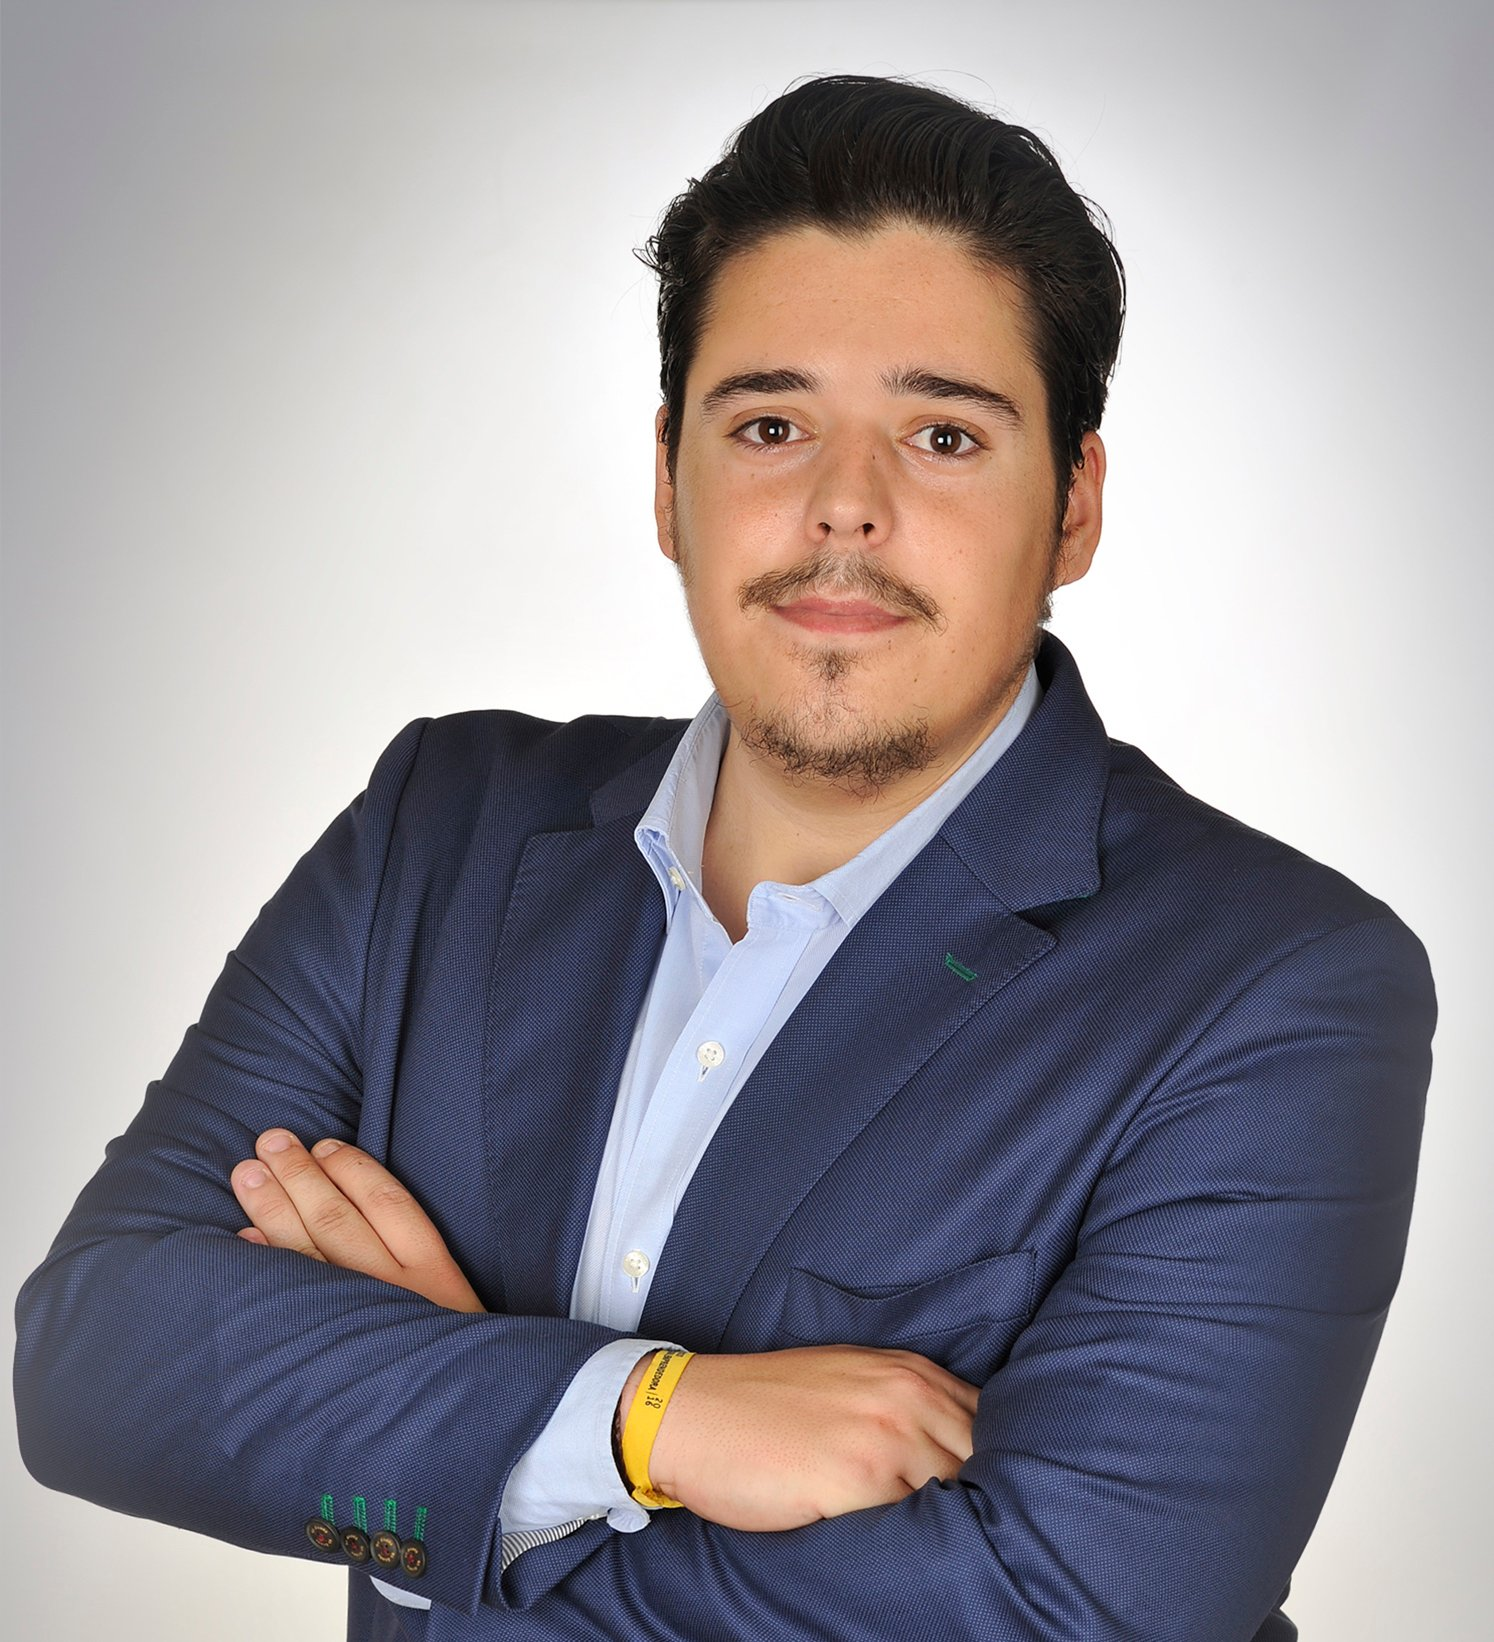 Francisco Coll Morales